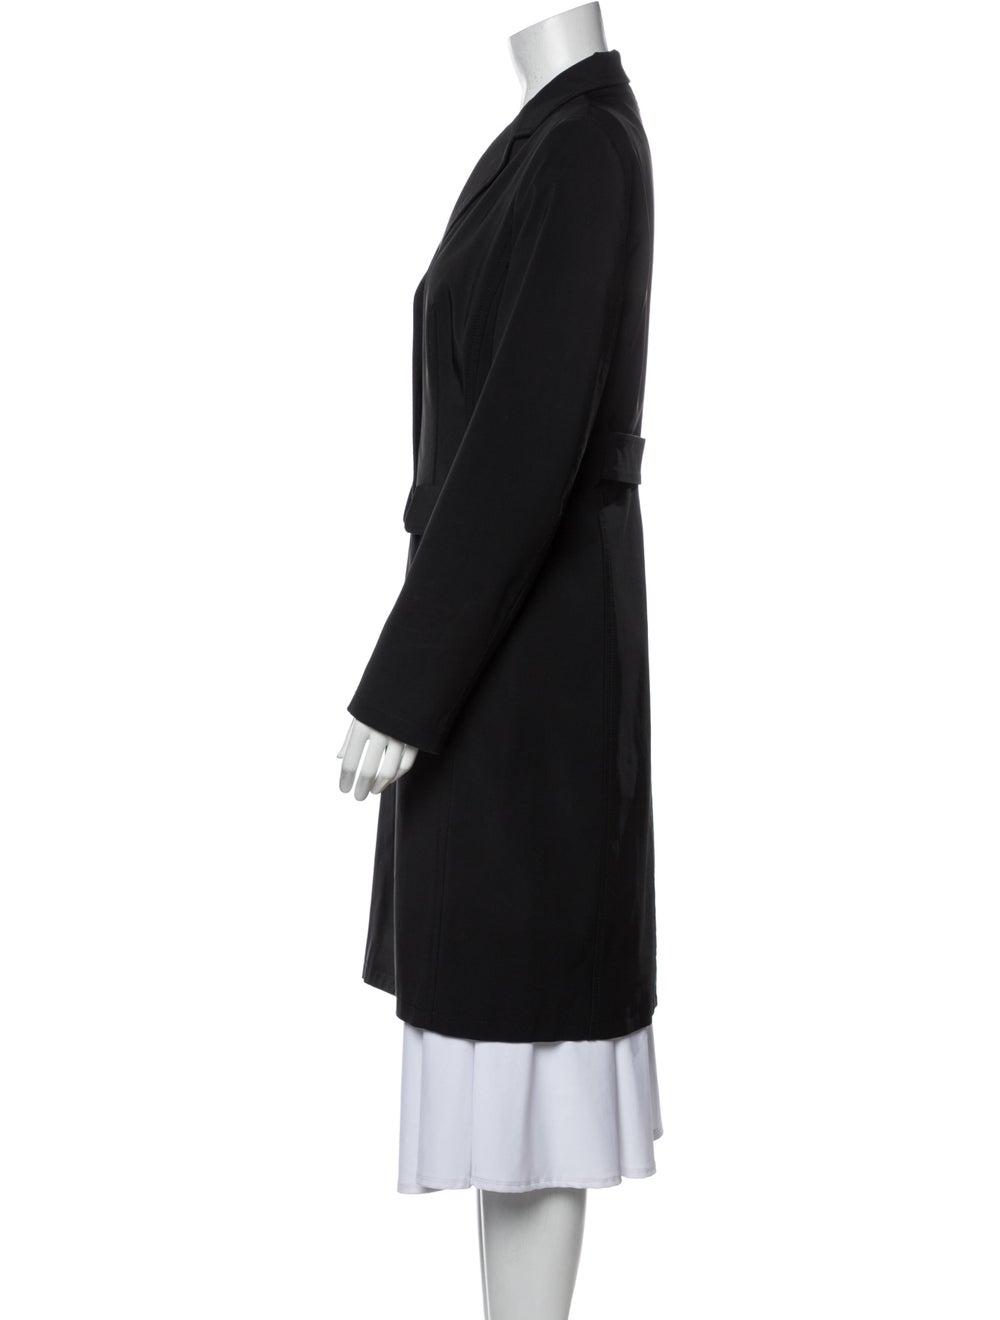 Prada Vintage 1990's Coat Black - image 2